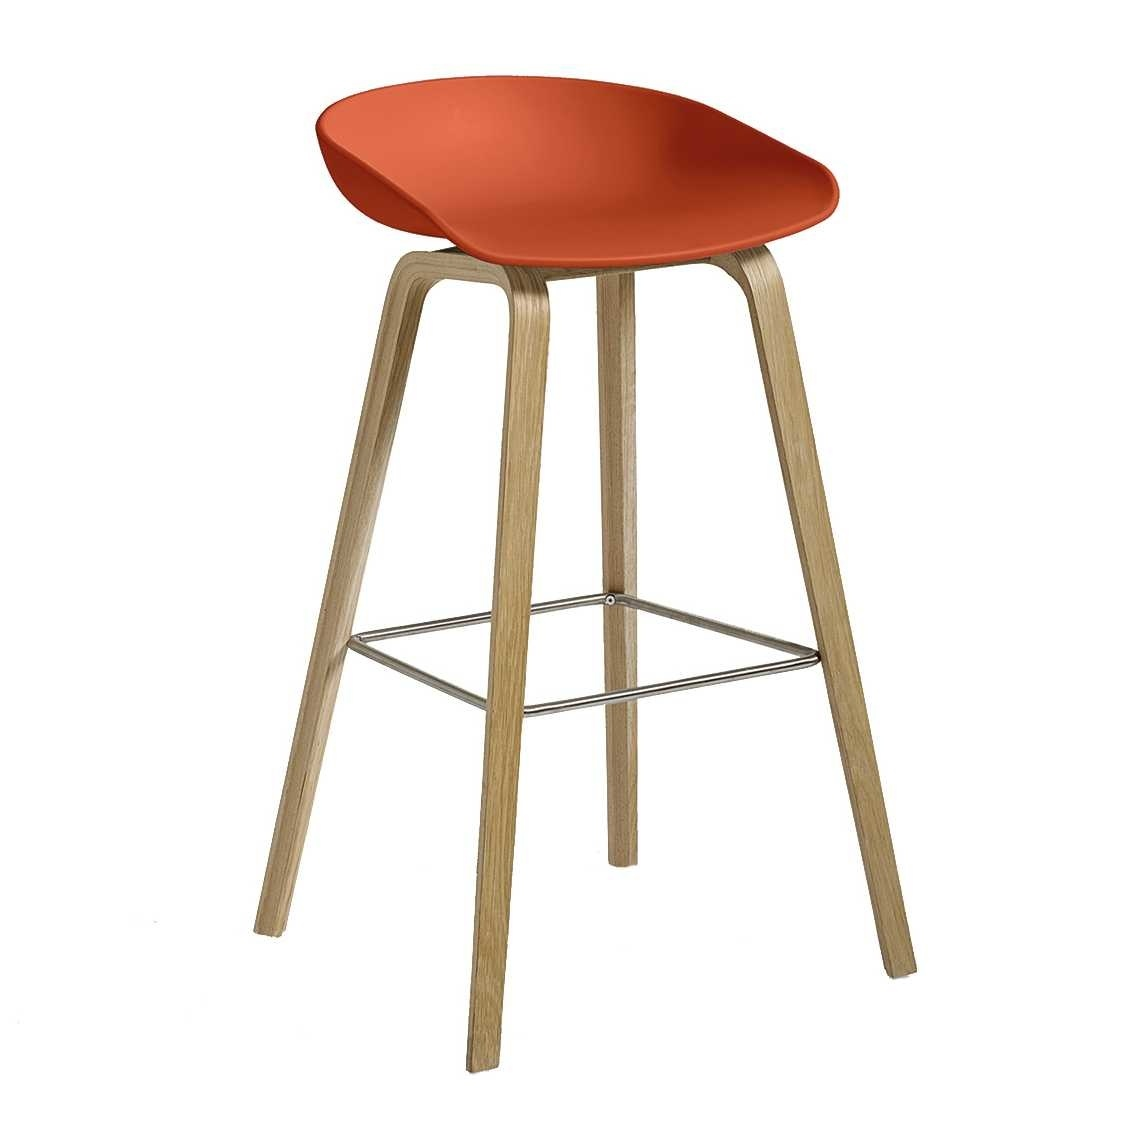 HAY AAS 32 Low - Matt Lacquered Oak Veneer / Orange Seat